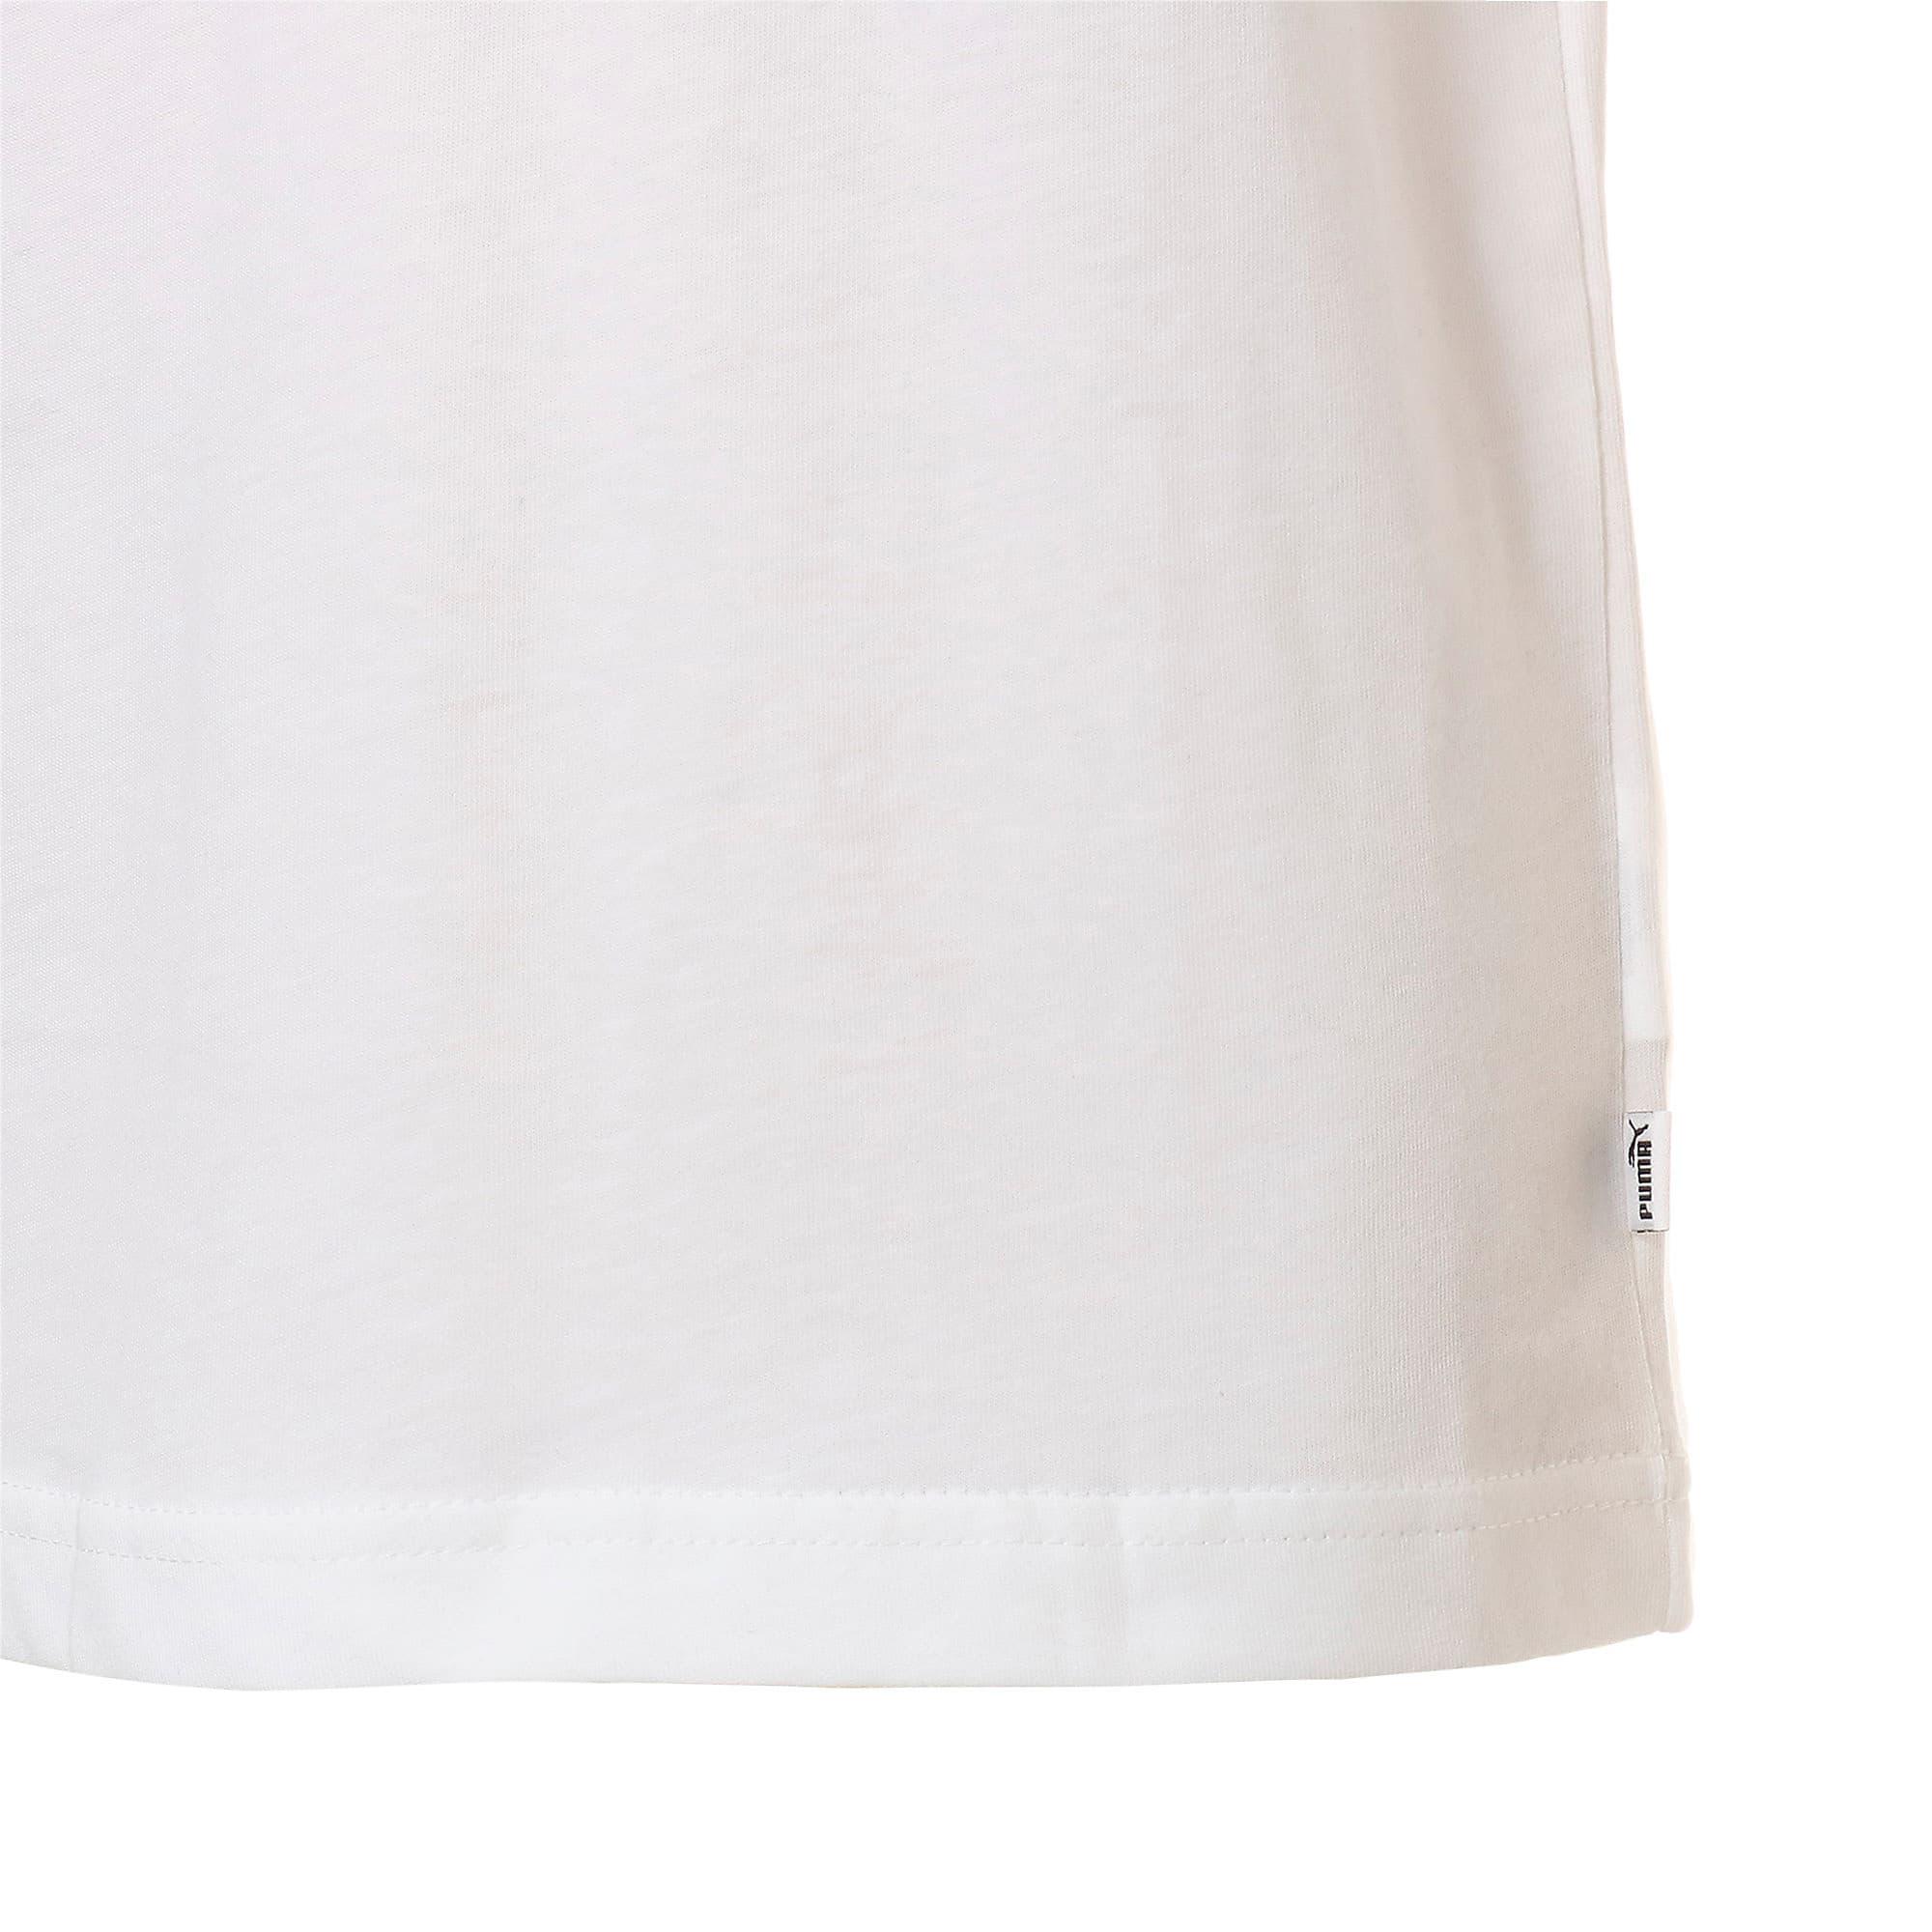 Thumbnail 6 of キッズ シティー 半袖 Tシャツ TOKYO 東京, Puma White, medium-JPN